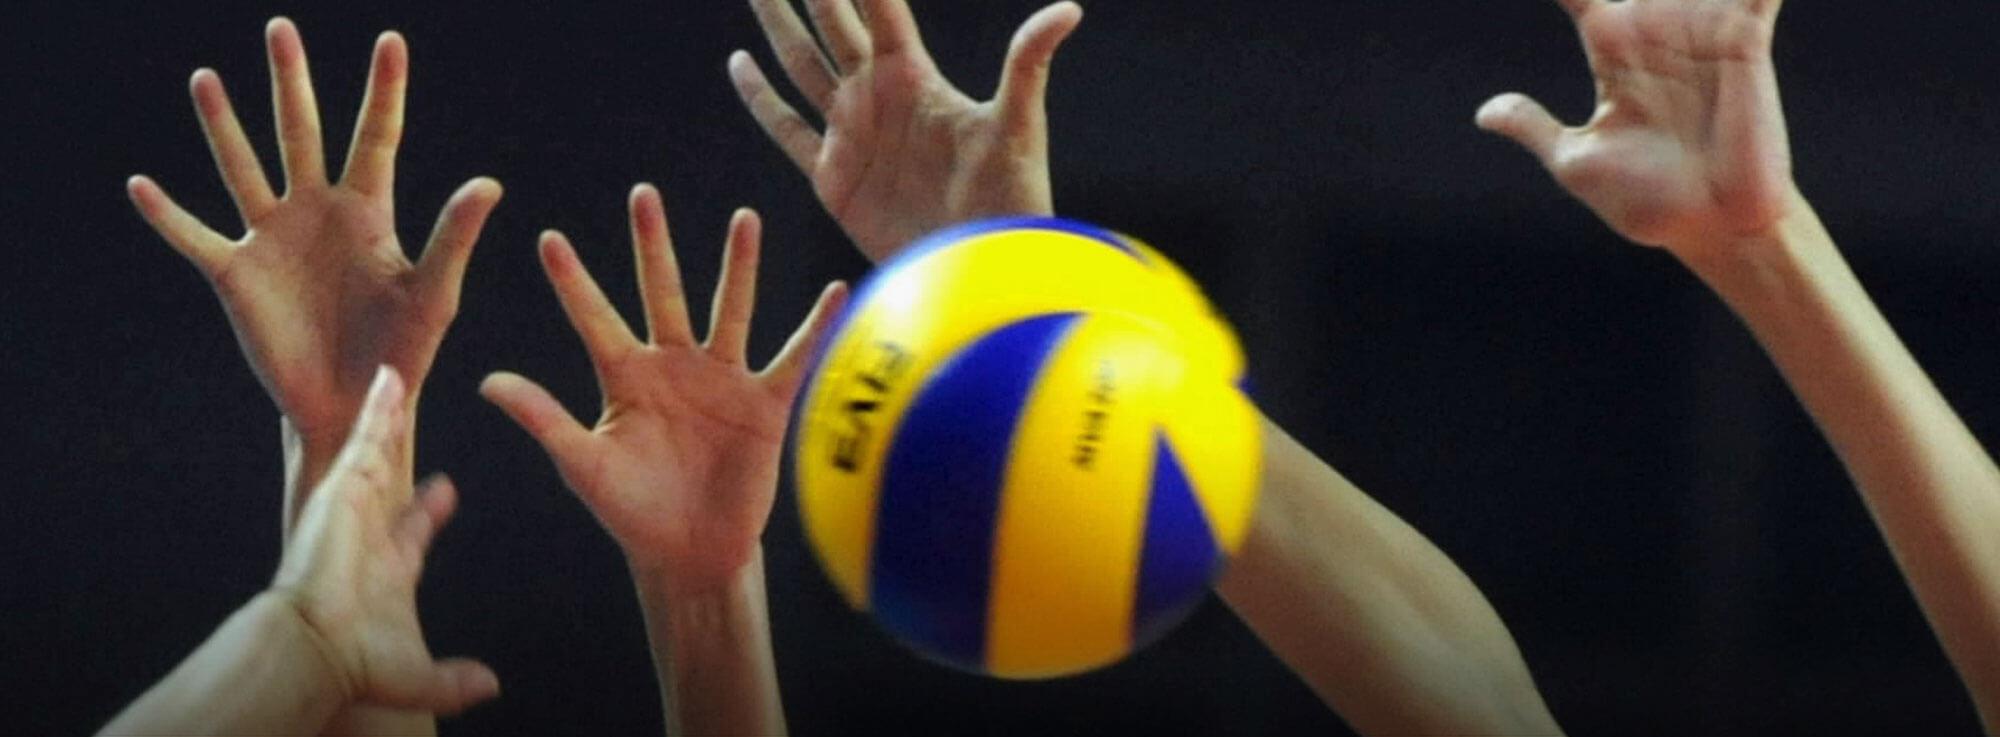 Martina franca: Eurovolley under 18 - Torneo di qualificazione